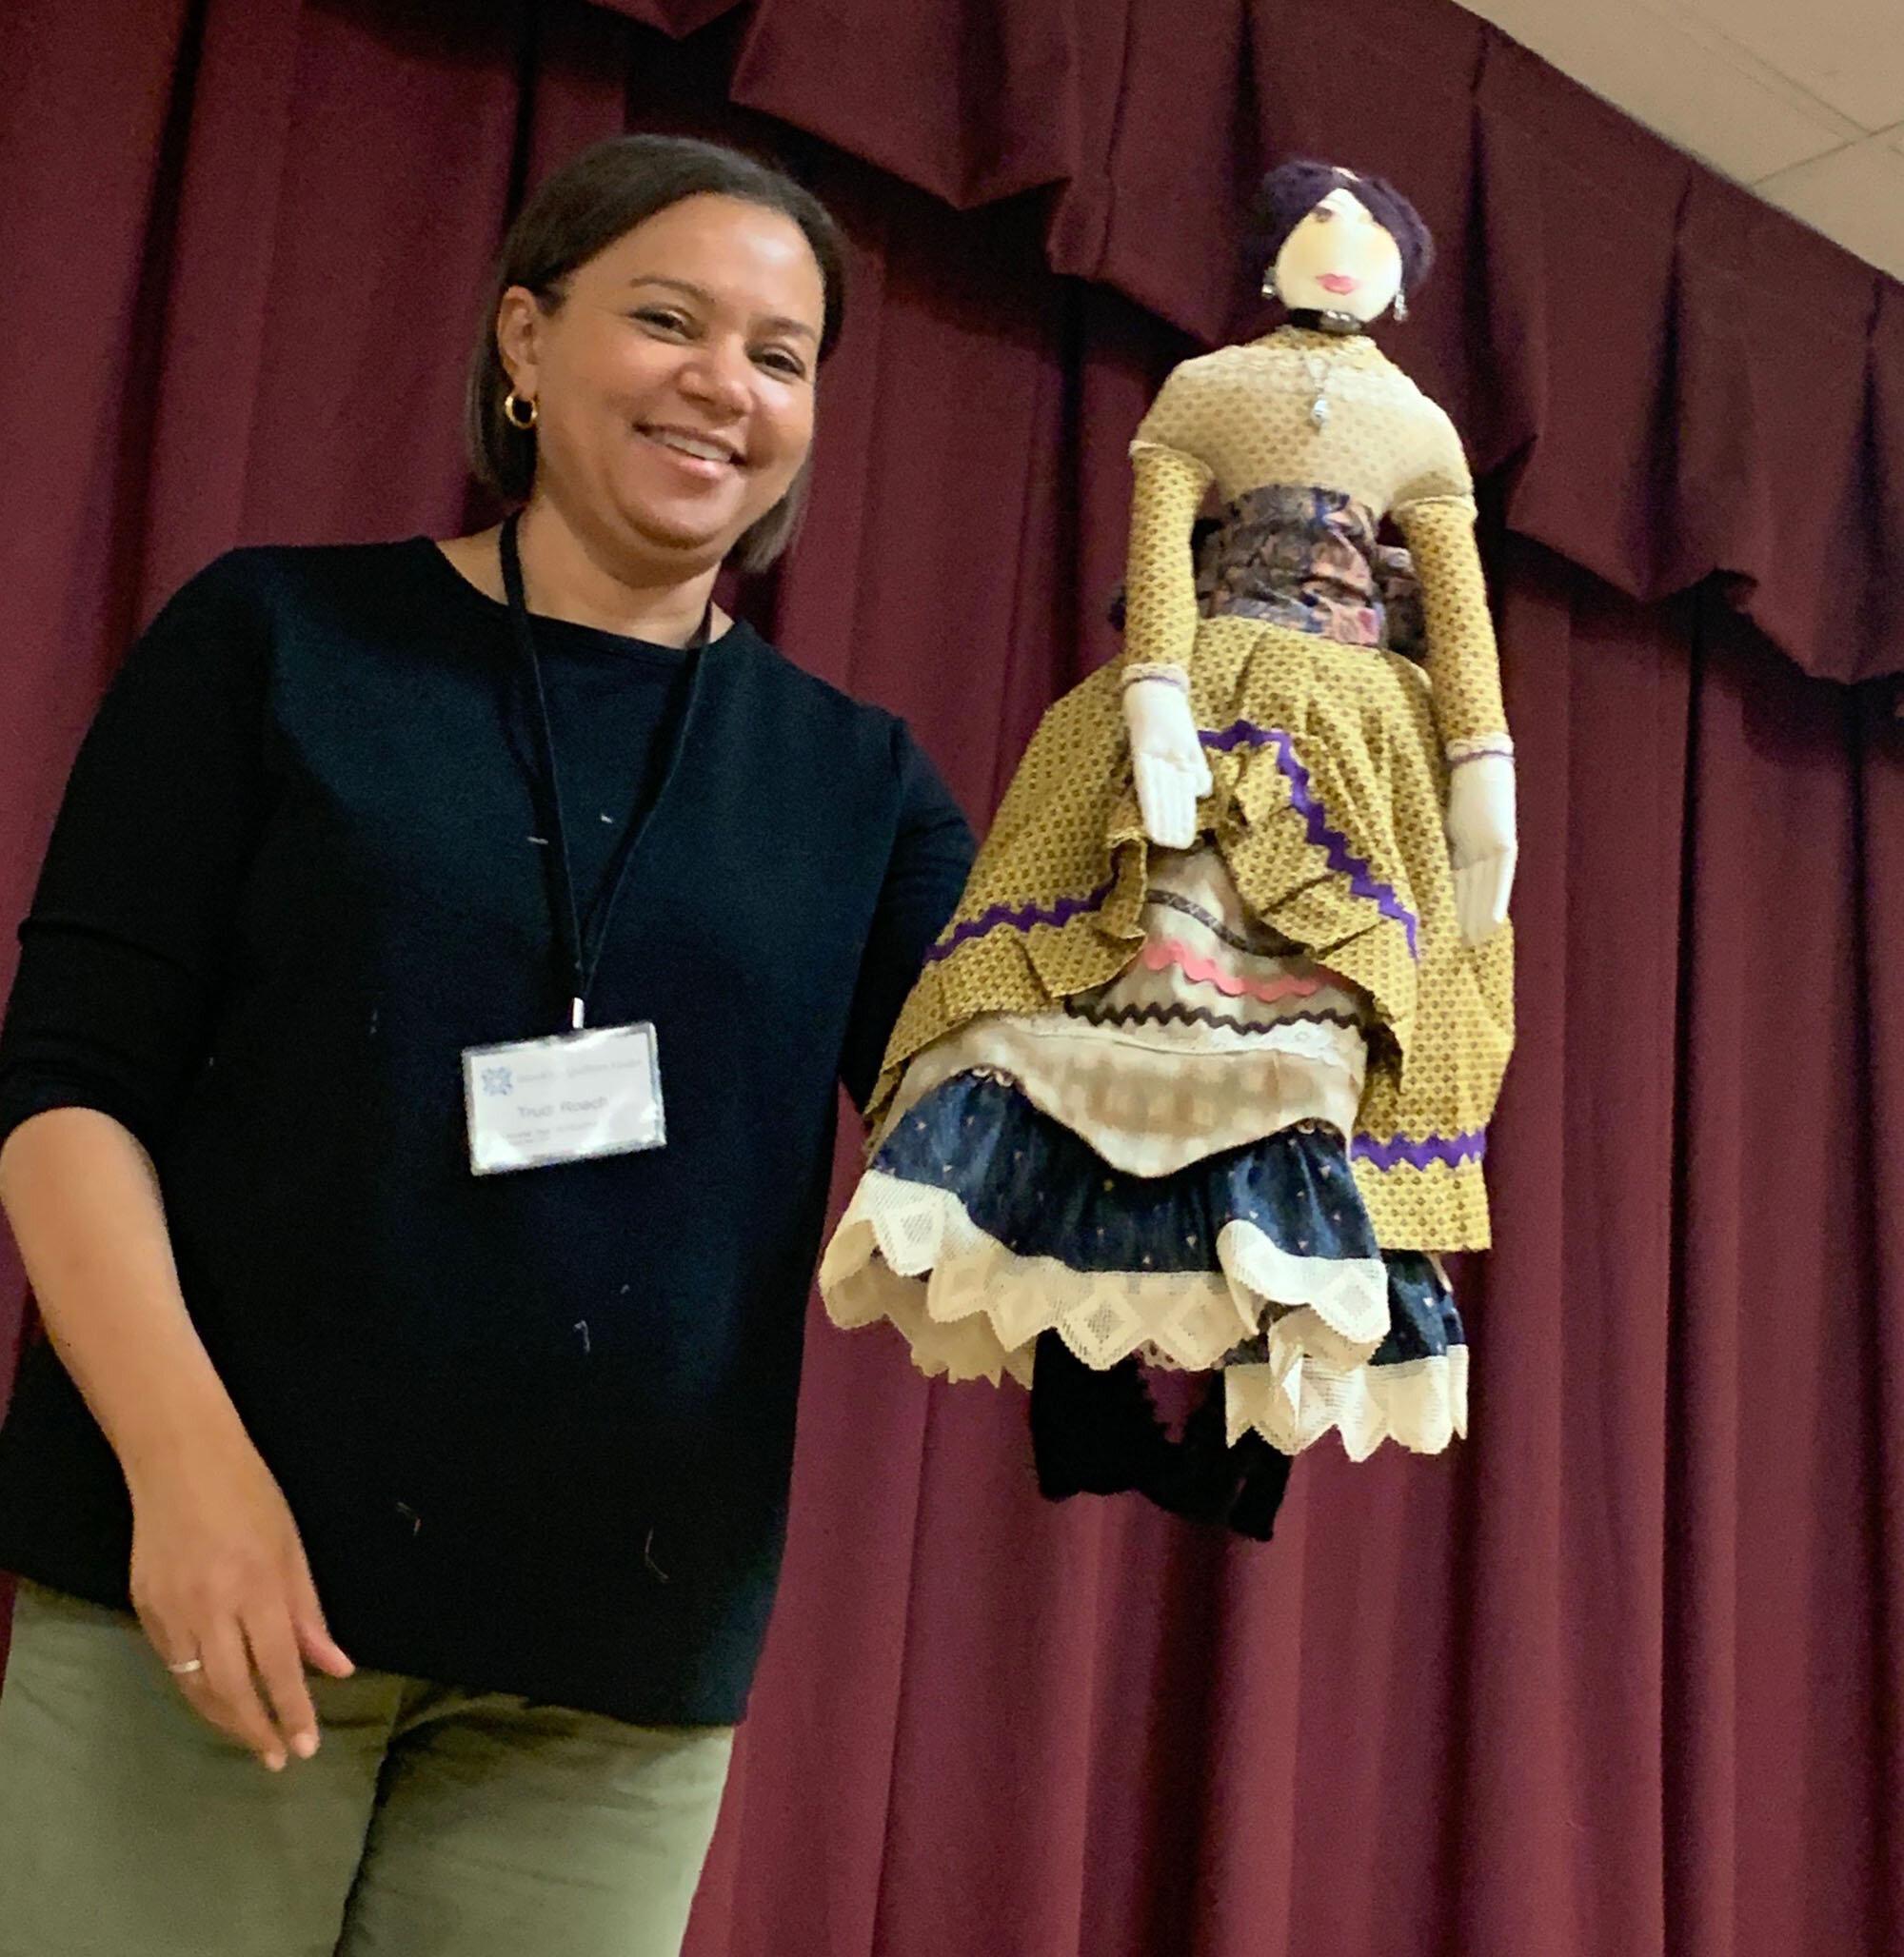 Doll by Mary Ann Hartley